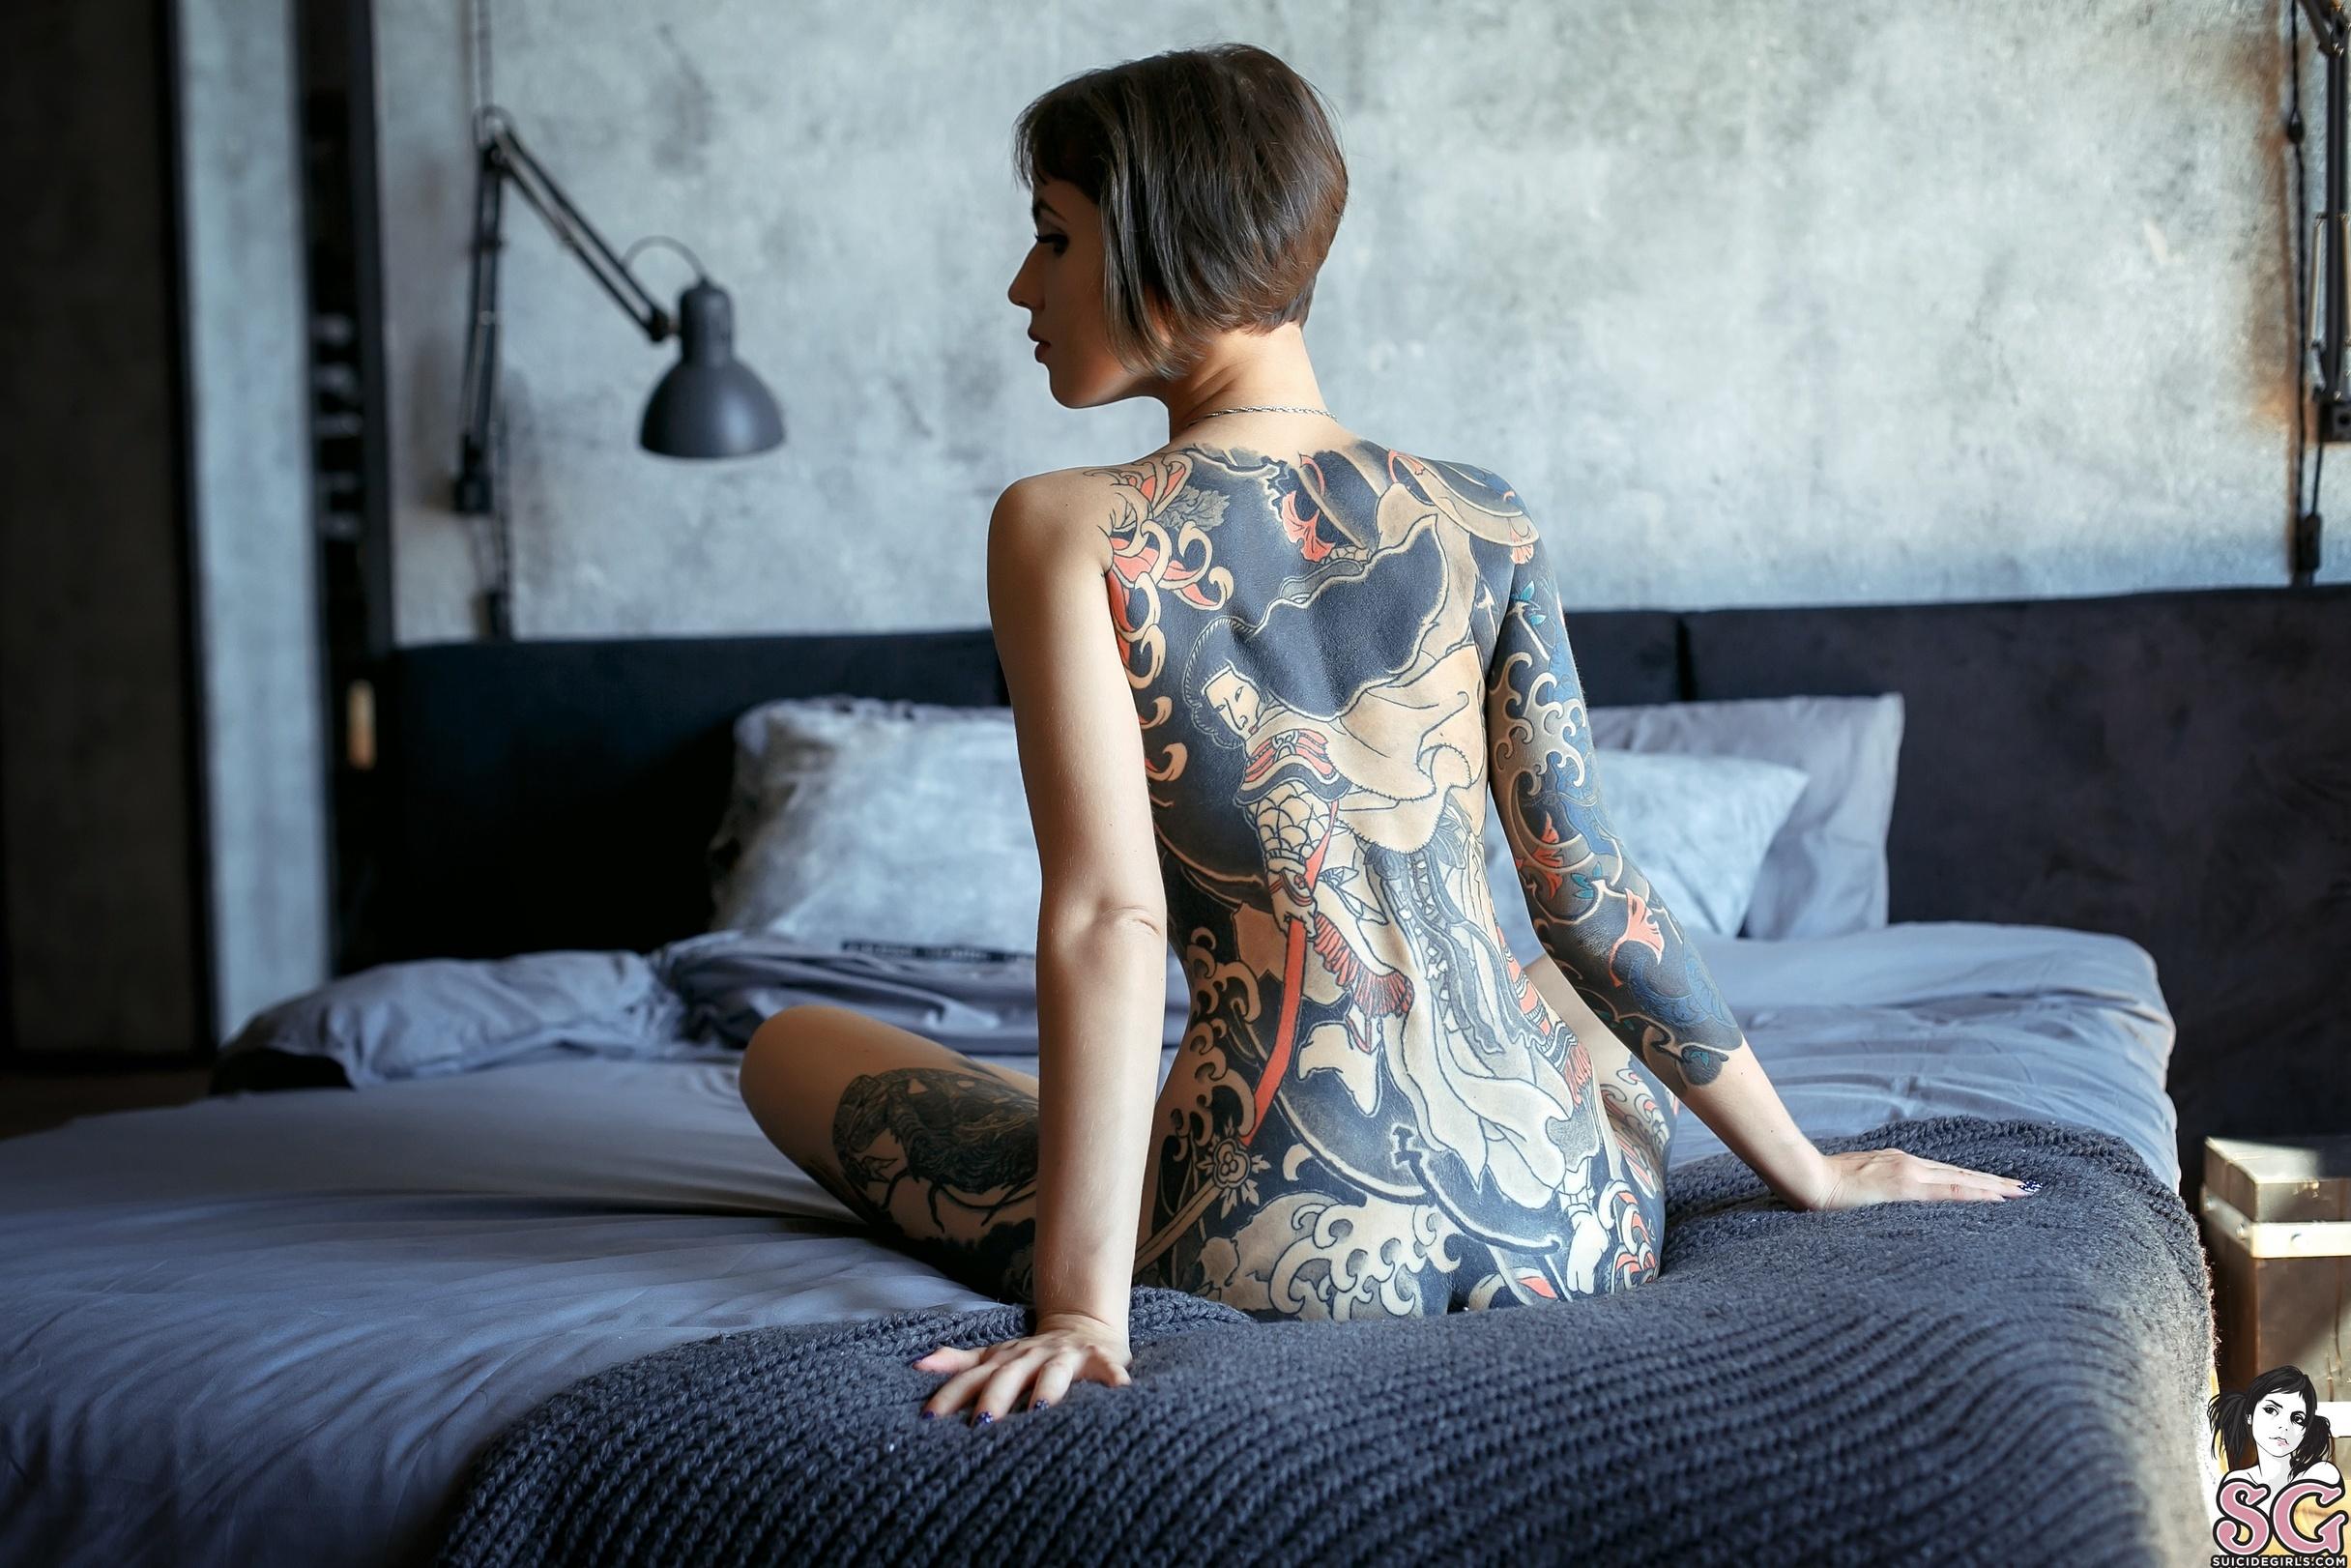 women, short hair, inked girls, in bed, Sagyansh Suicide